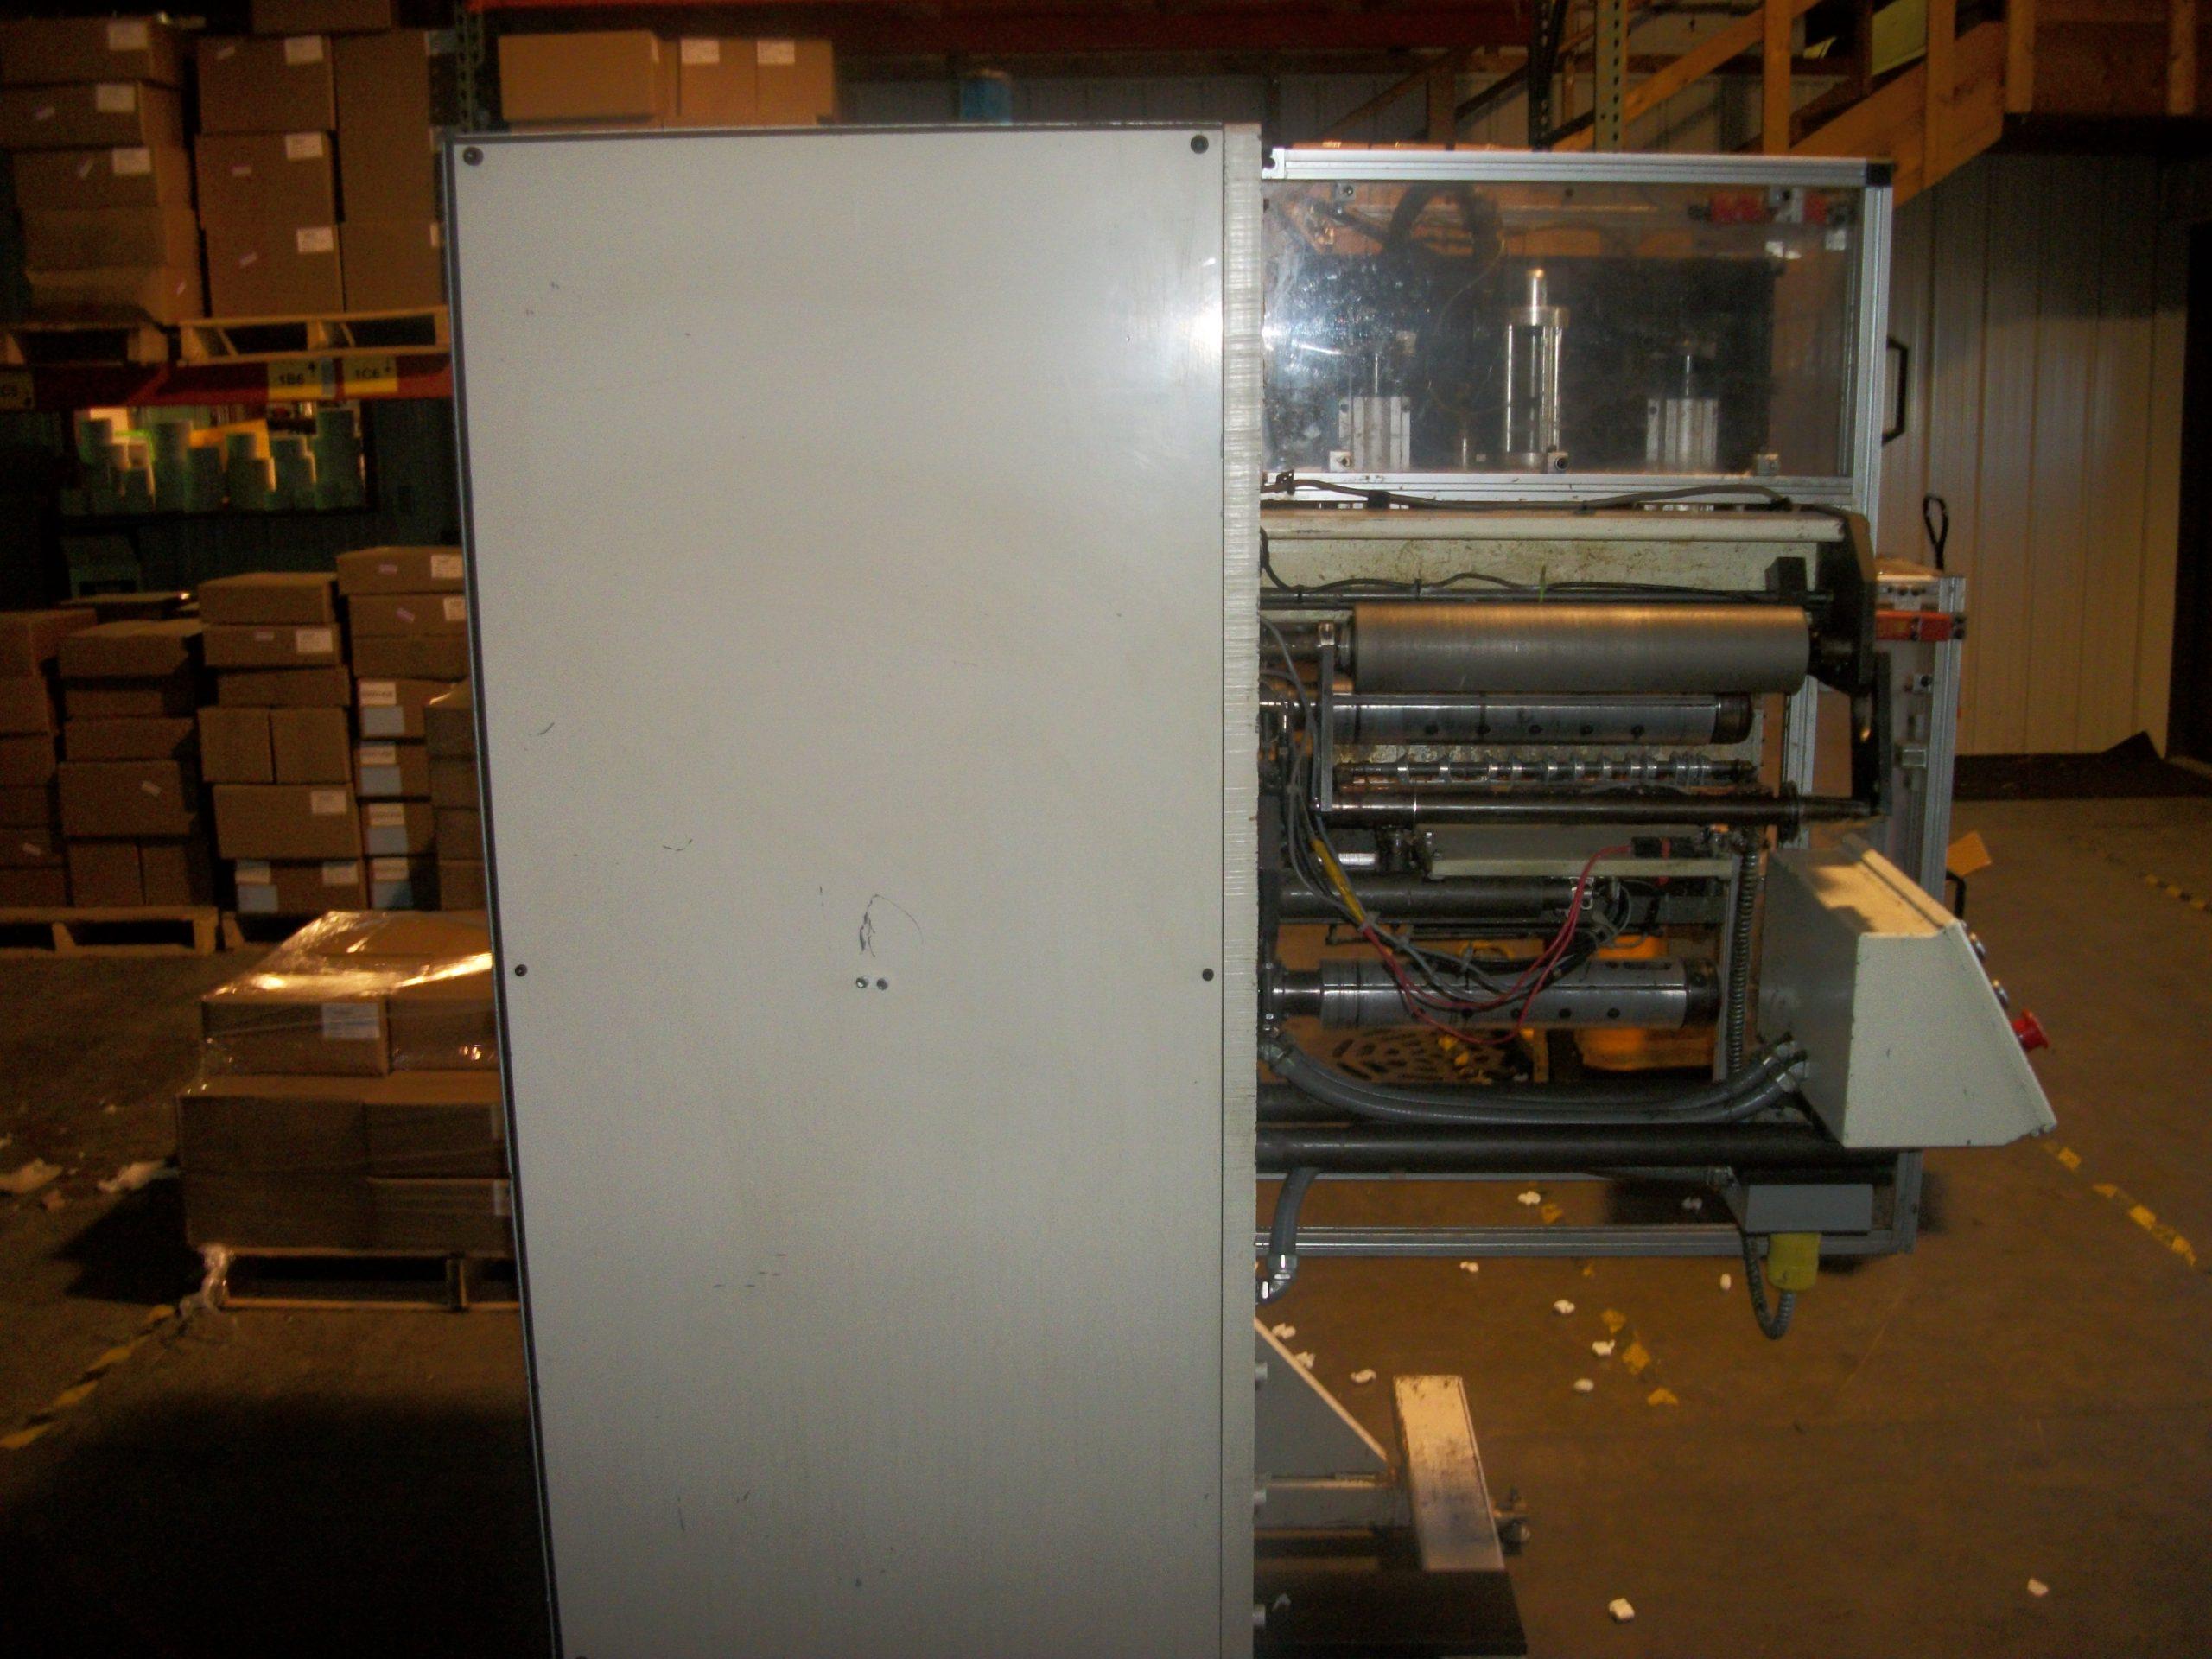 KTI JR1312 Turret Rewinder - Used Flexo Printing Presses and Used Flexographic Equipment-5